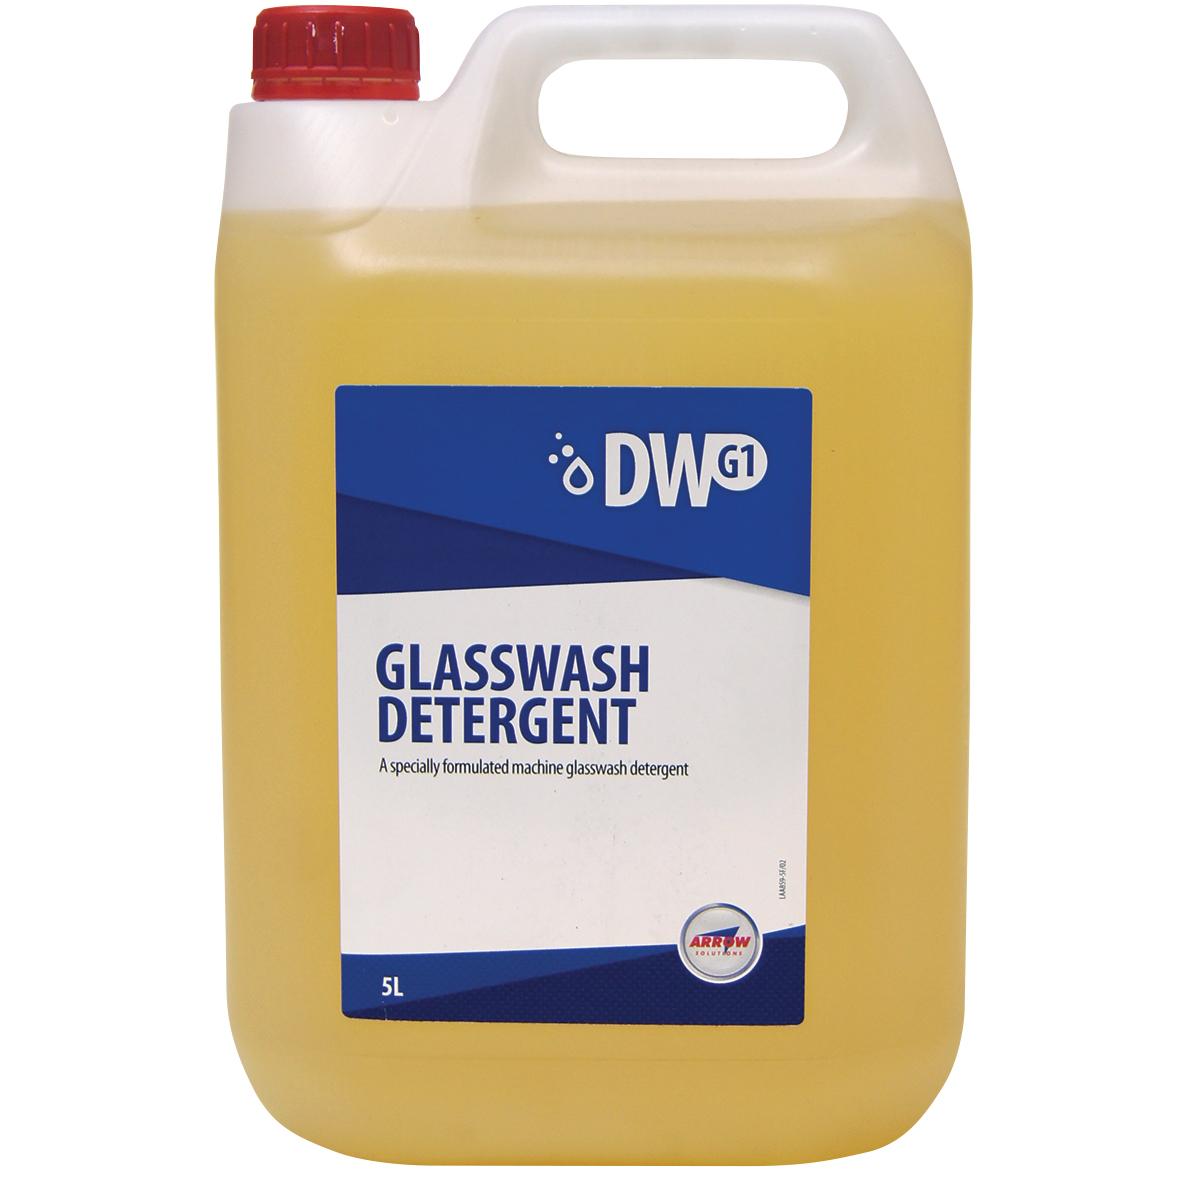 DW G1 Glasswash Detergent product image